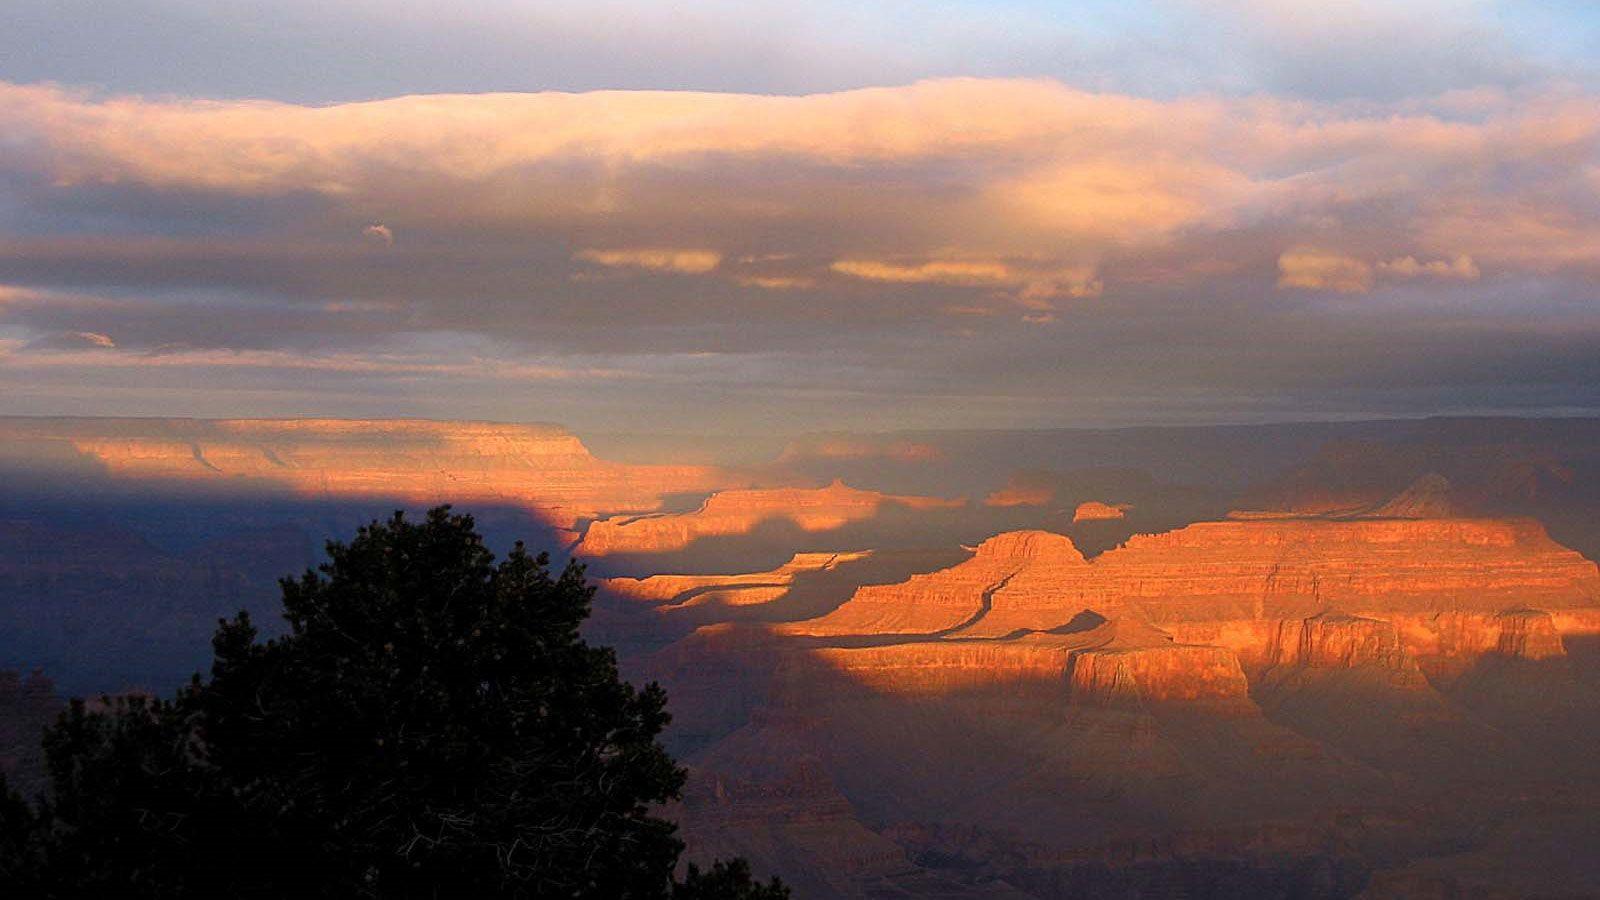 The sun setting over the Grand Canyon in Arizona